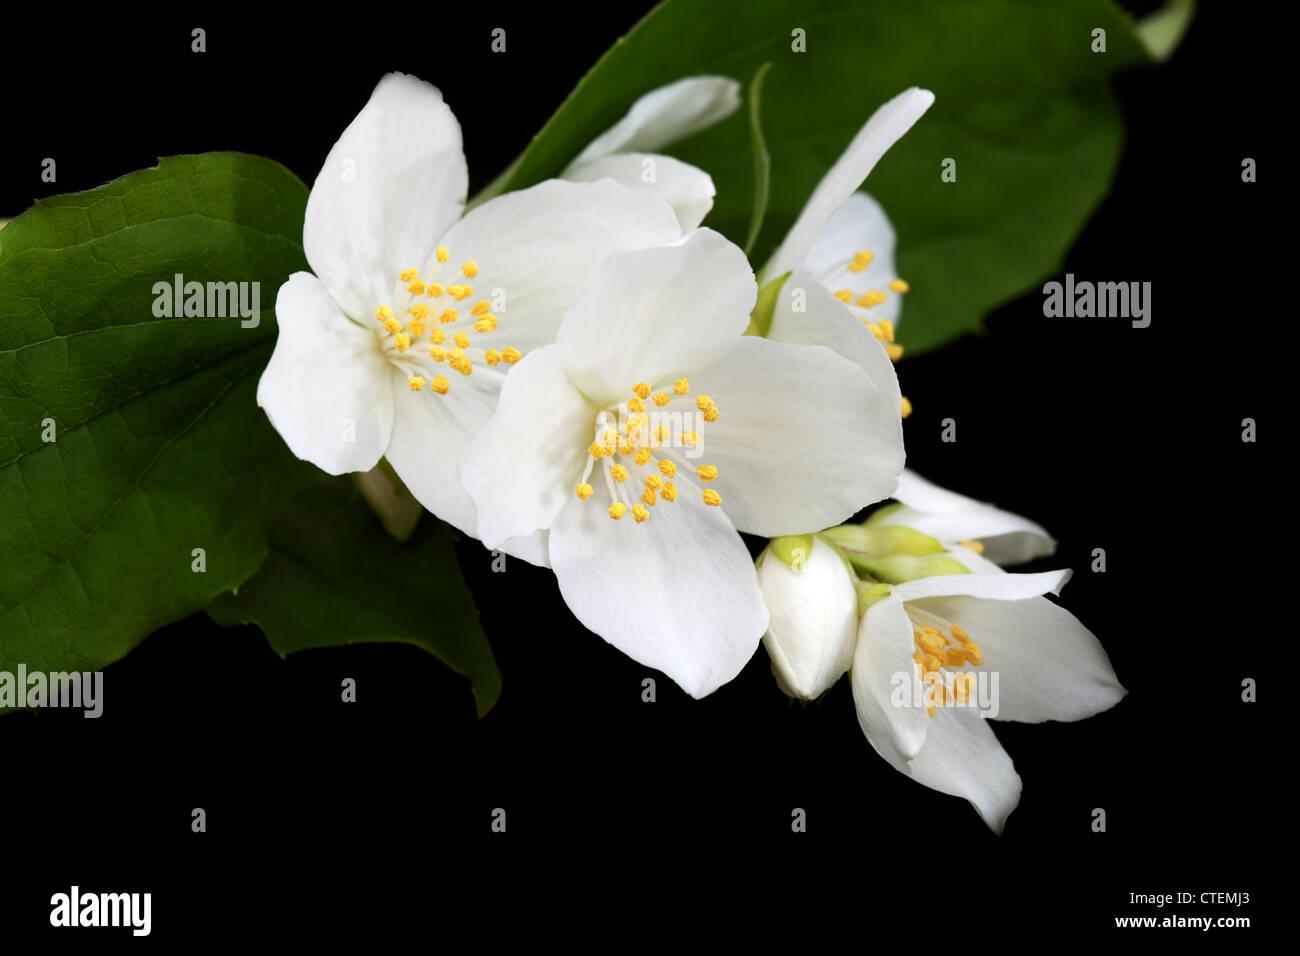 beautiful jasmine flowers on black background Stock Photo Royalty